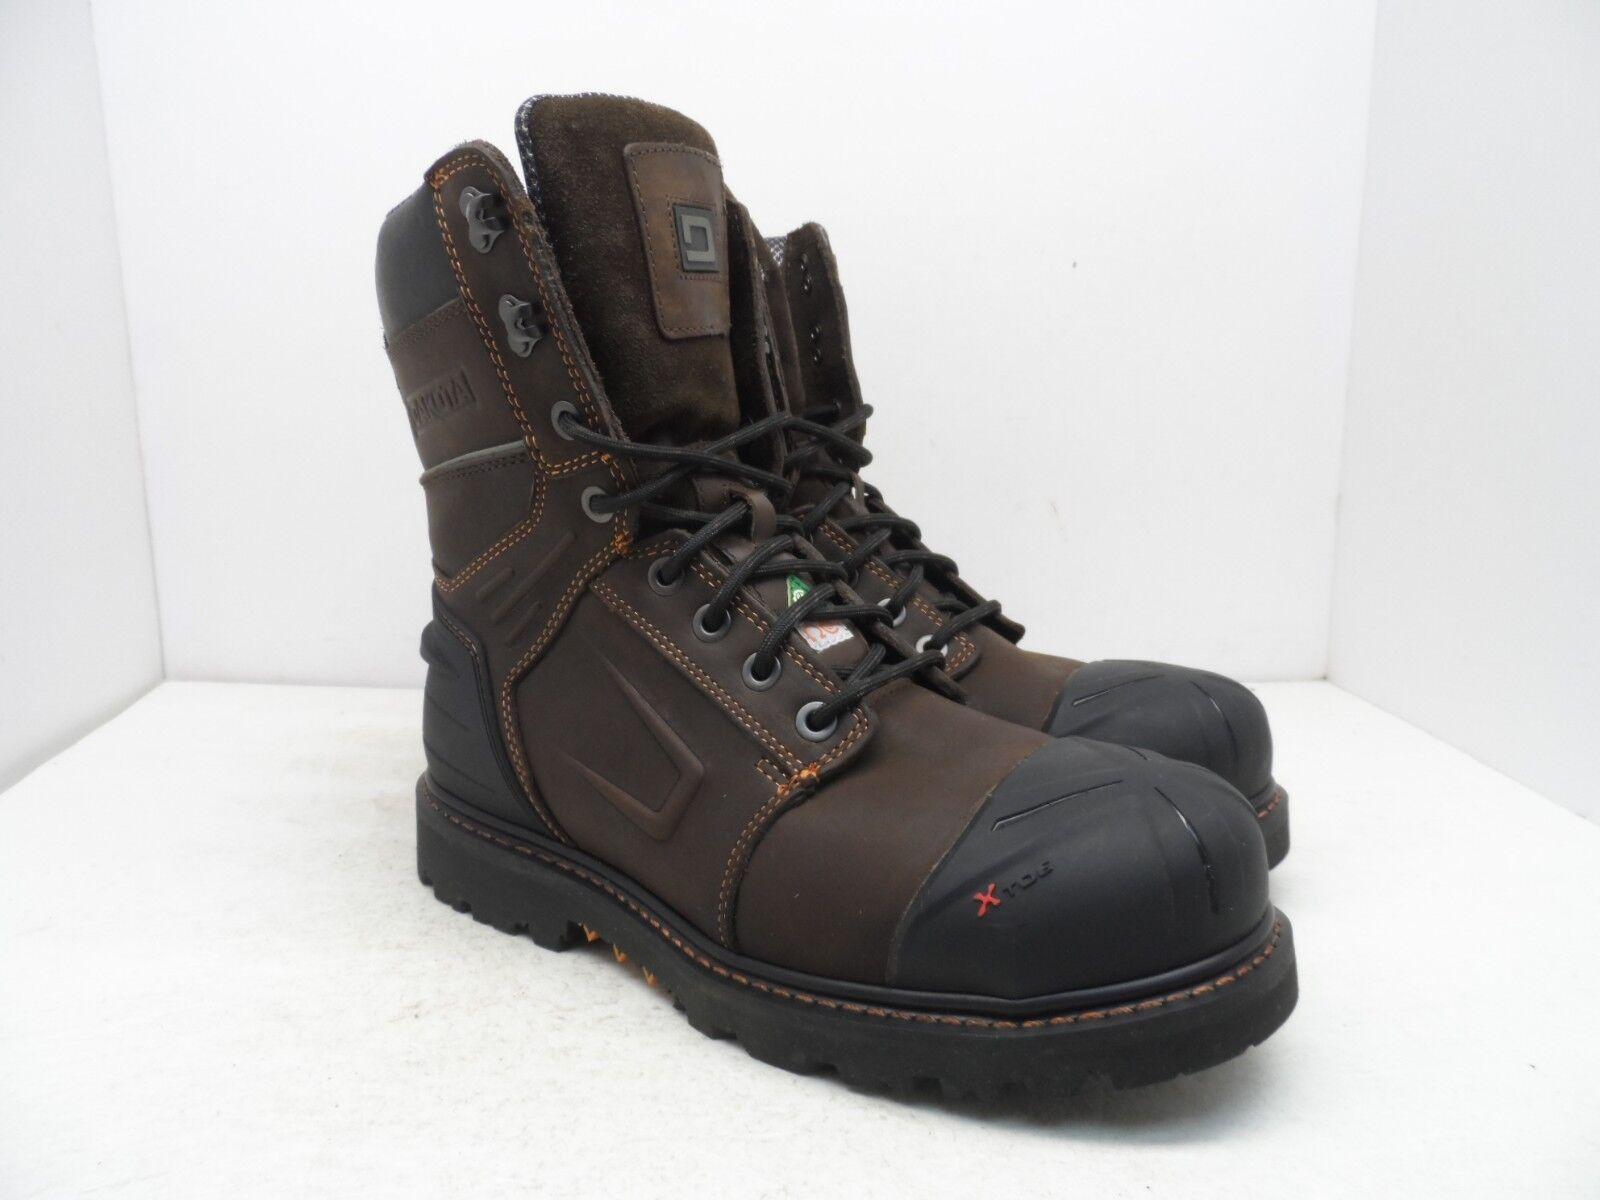 Dakota Men's X-Toe 8  Quad Comfort Steel Toe Composite Plate Boot Brown 10.5M